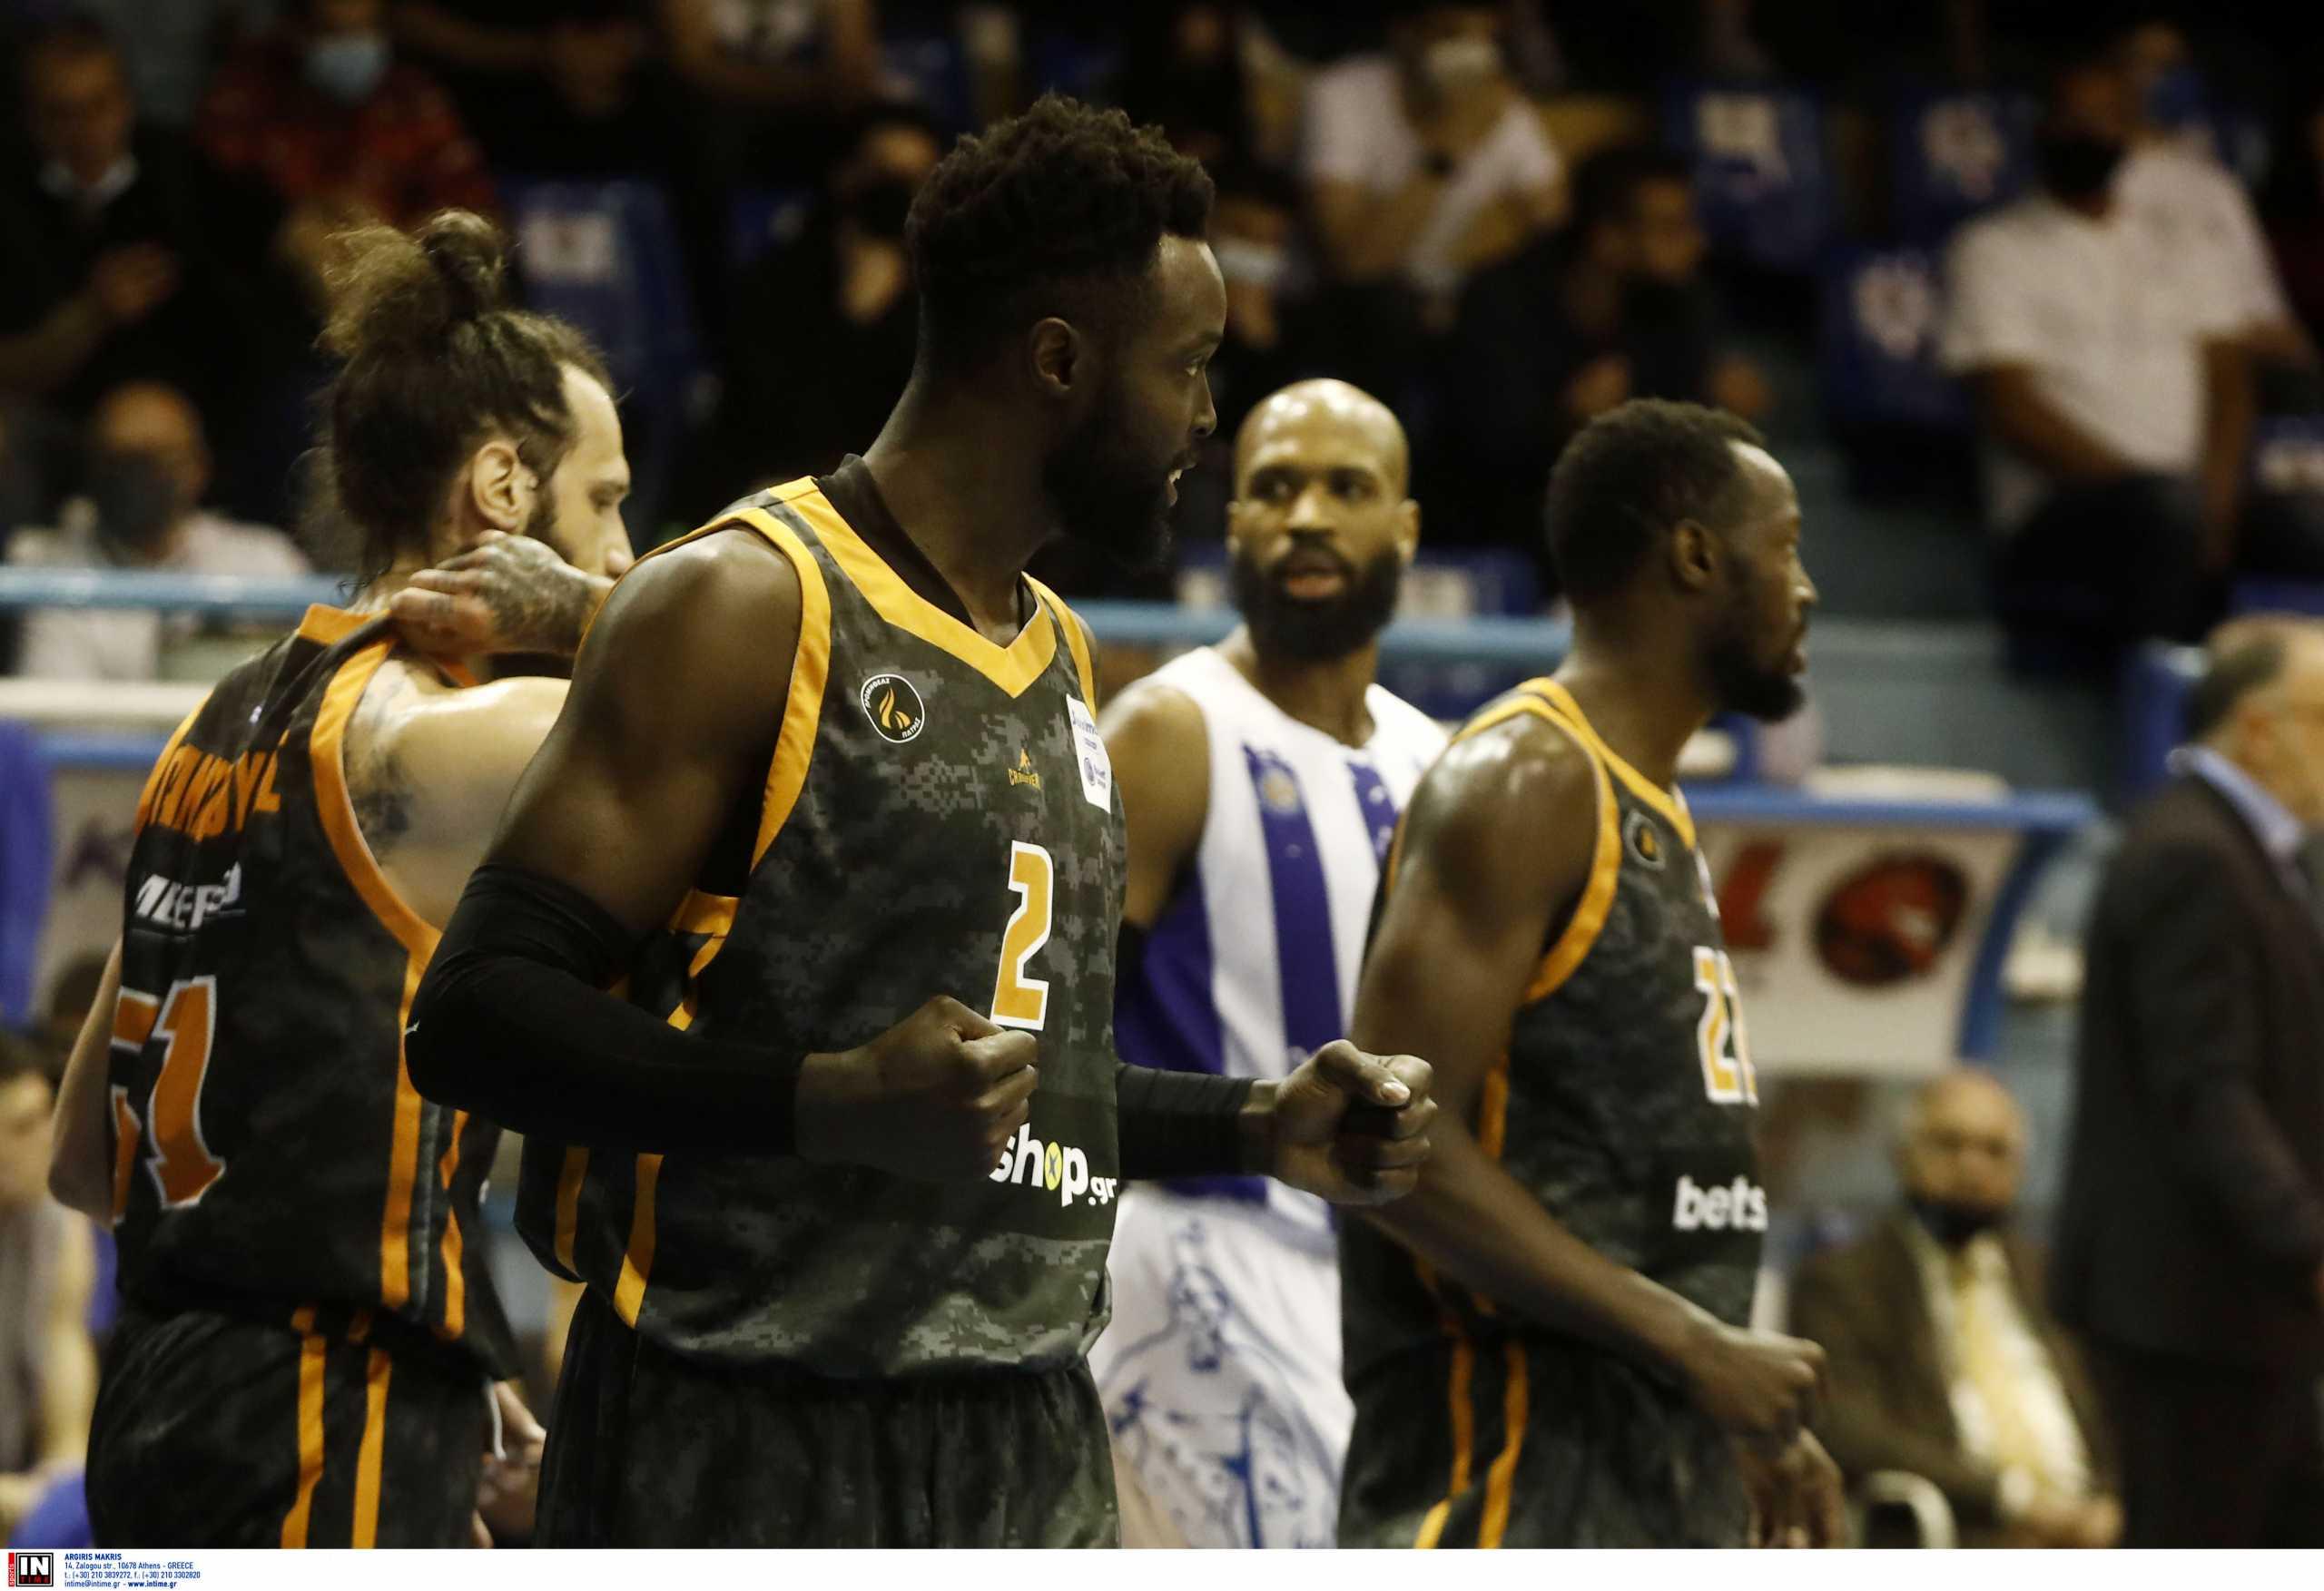 Basket League: Ο Προμηθέας άφησε εκτός 8άδας τον Ηρακλή – Τα «ζευγάρια» στα play off